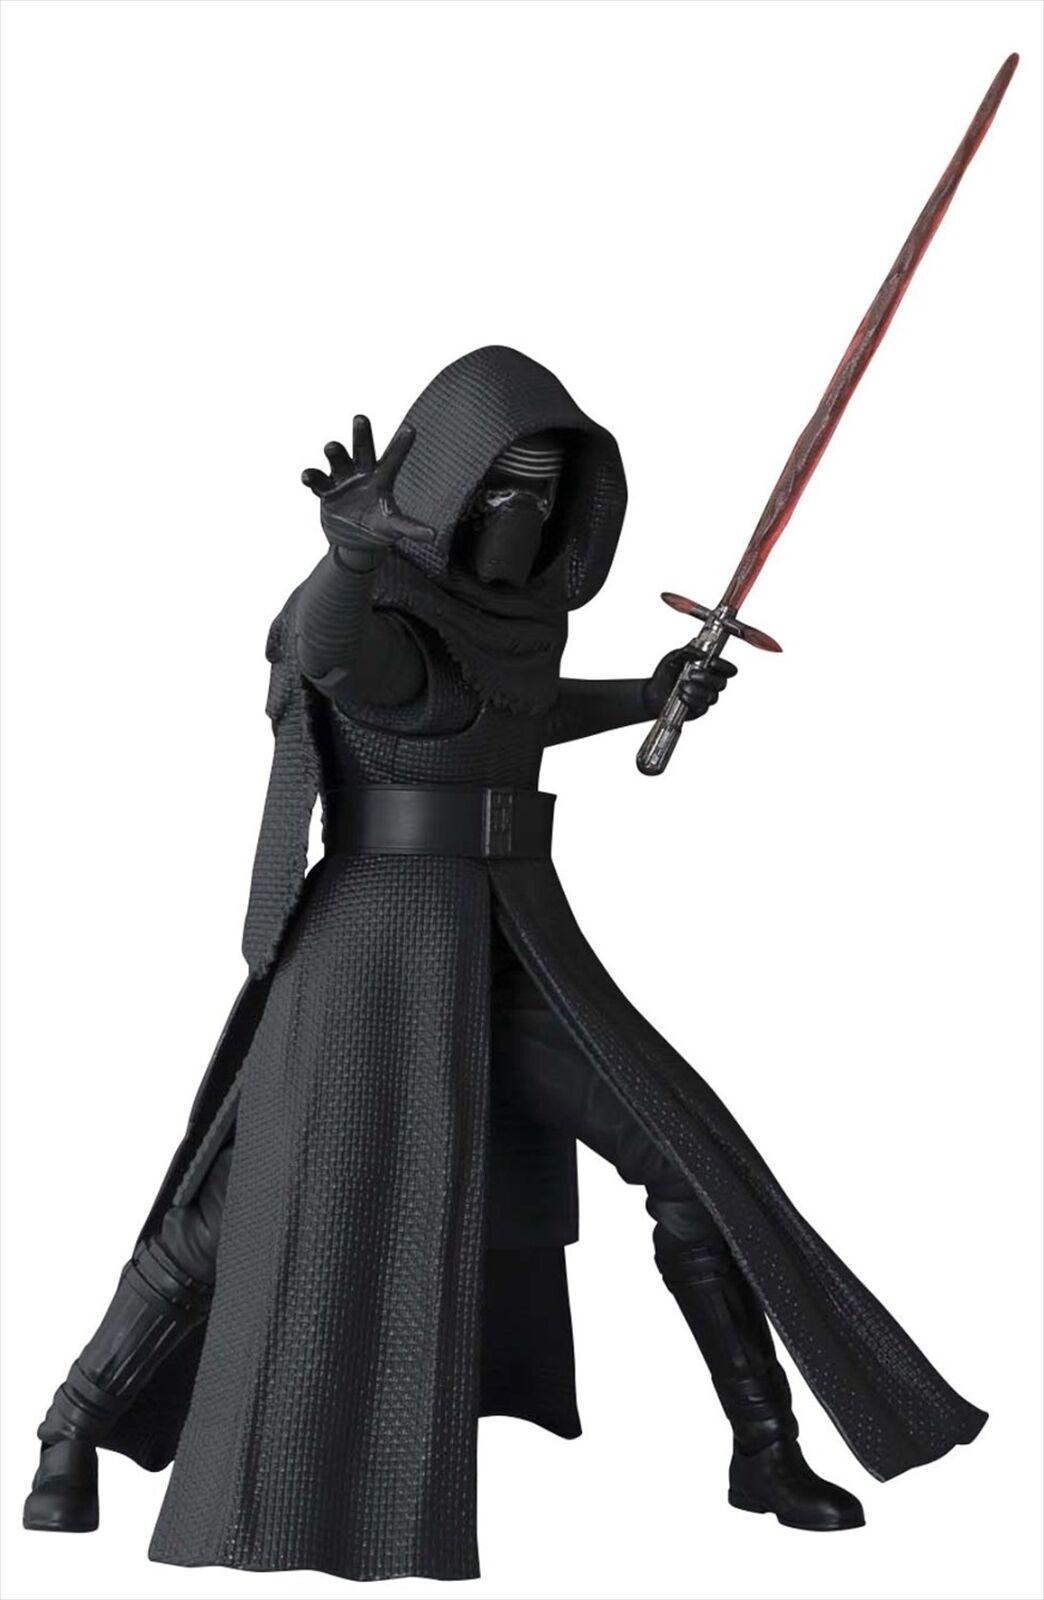 Bandai Bandai Bandai S.H. Figuarts Star Wars The Force Awakens Kylo Ren Action Figure a68364